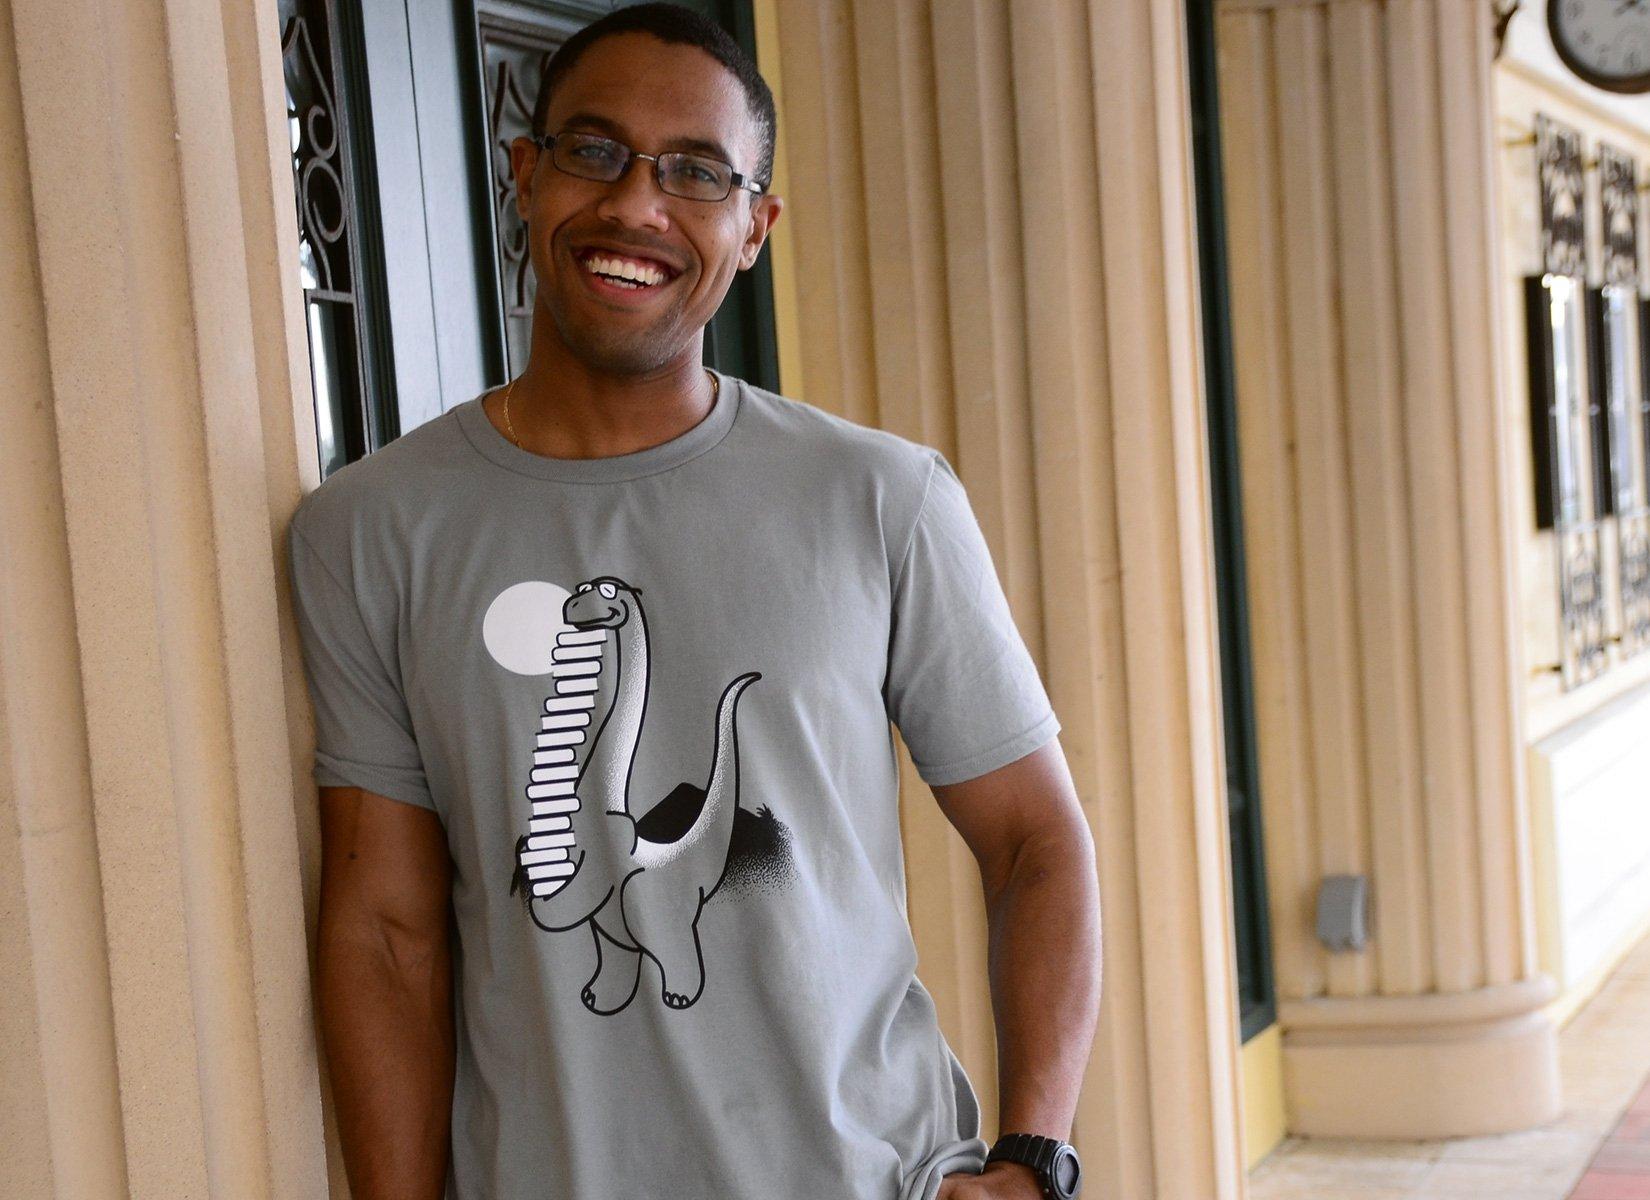 Bookosaurus on Mens T-Shirt